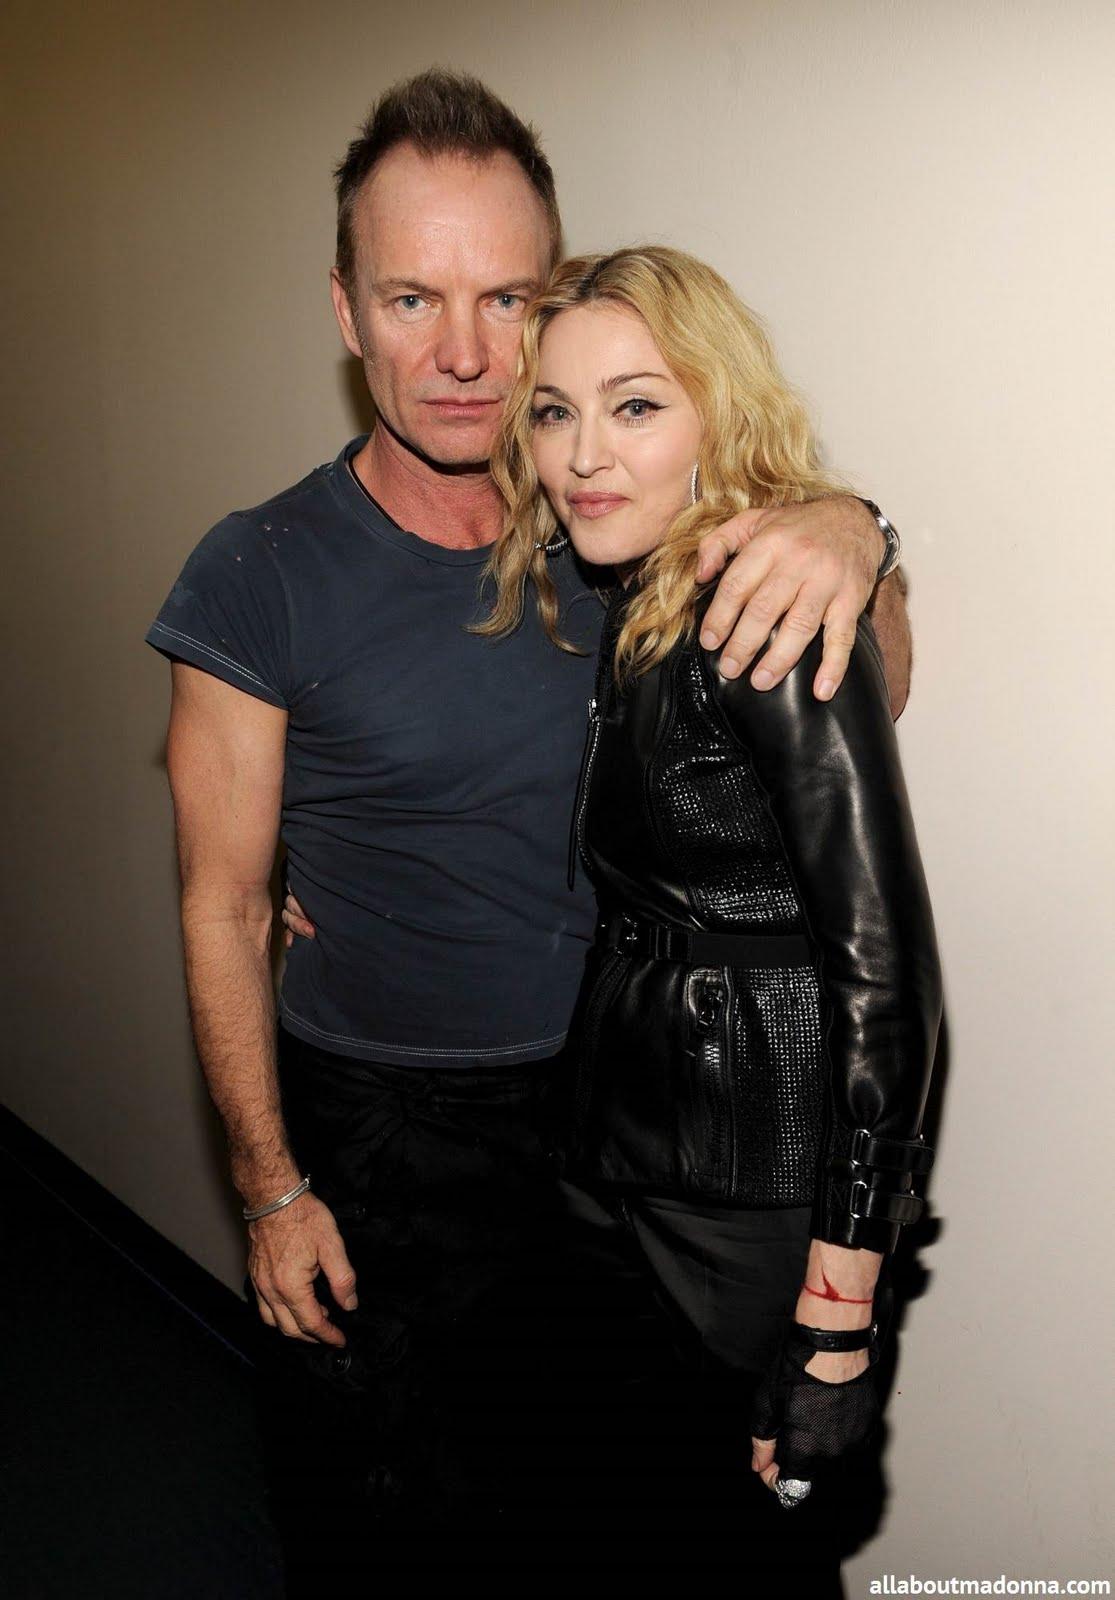 http://4.bp.blogspot.com/_QZk9-5nrPSU/S1sZG3Ez78I/AAAAAAAACbE/dTy9o2tI_Kw/s1600/Madonna+and+Sting+%281%29.jpg